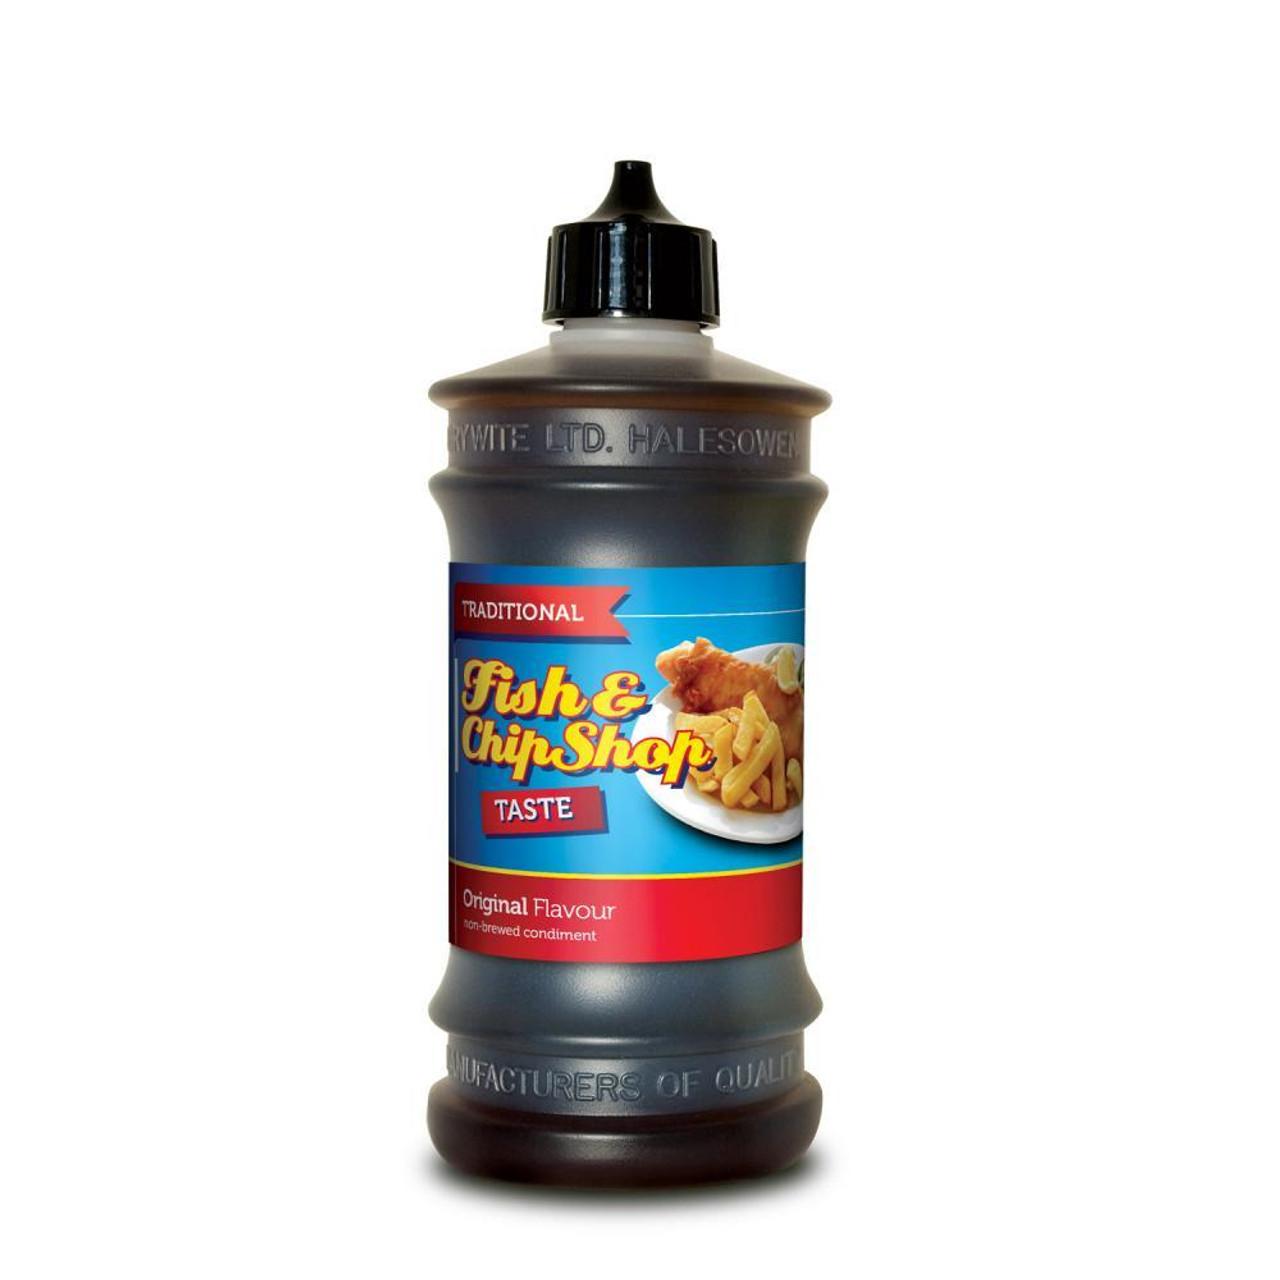 Fish & Chip Shop Vinegar